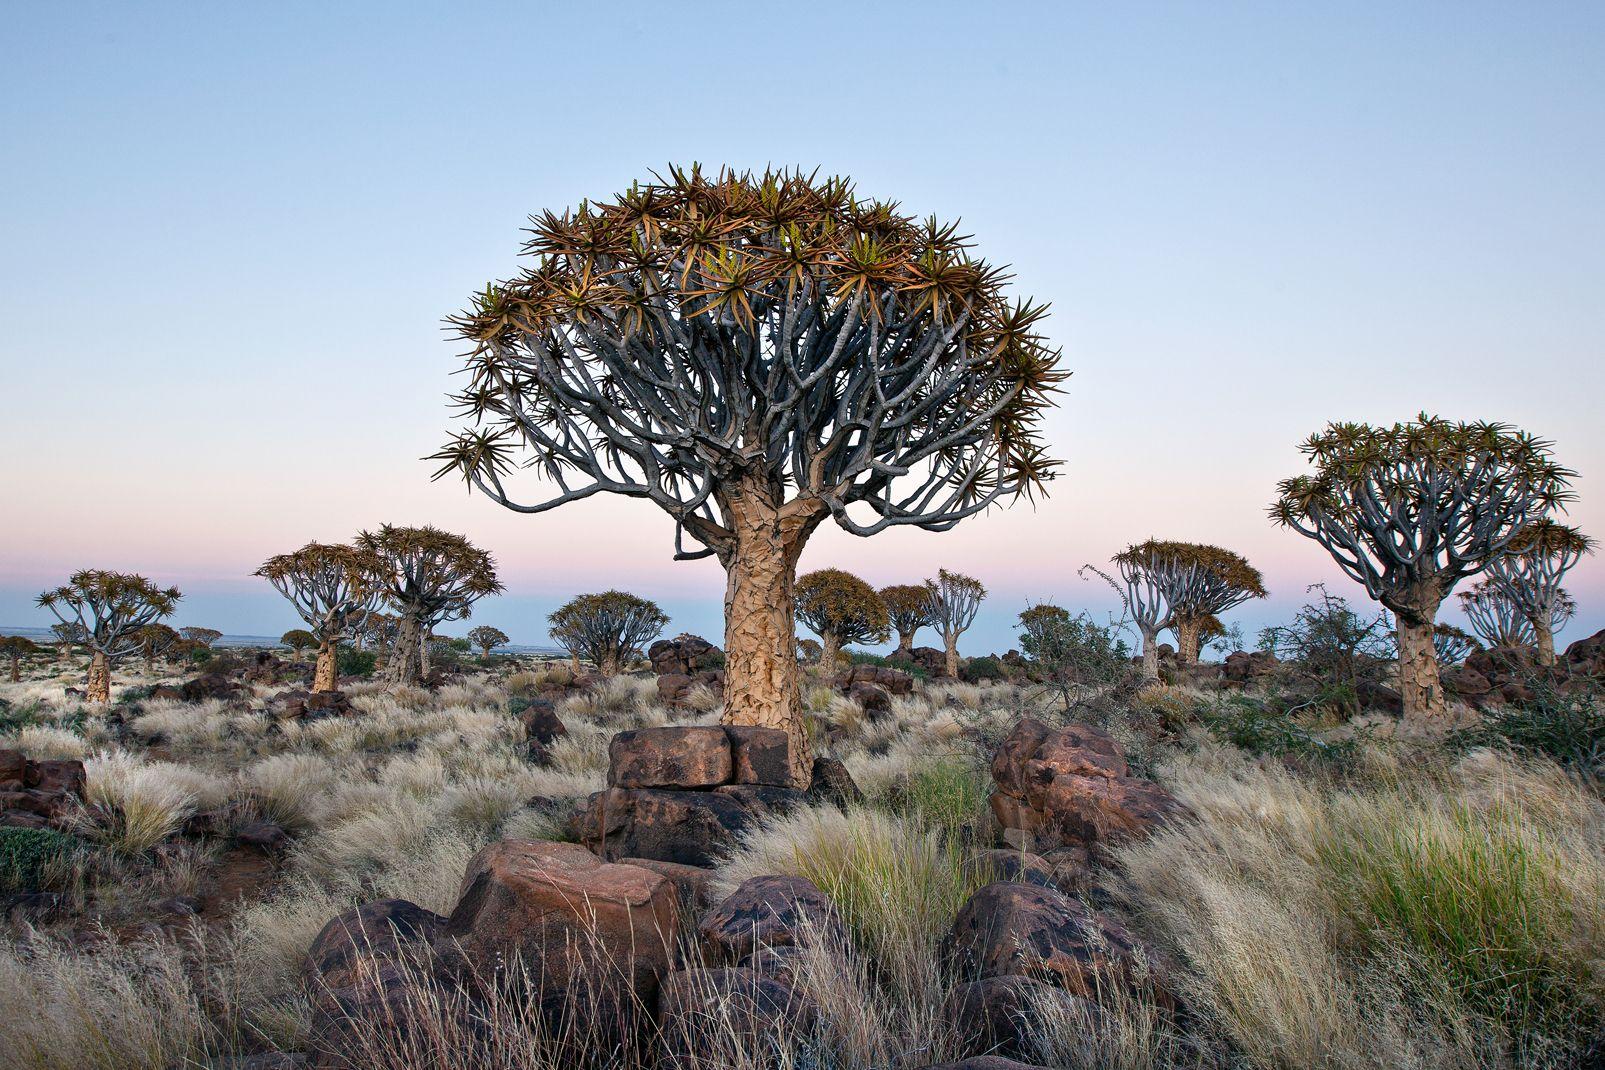 afrique, namibie, forêt, quivertree, arbre, kokerboom